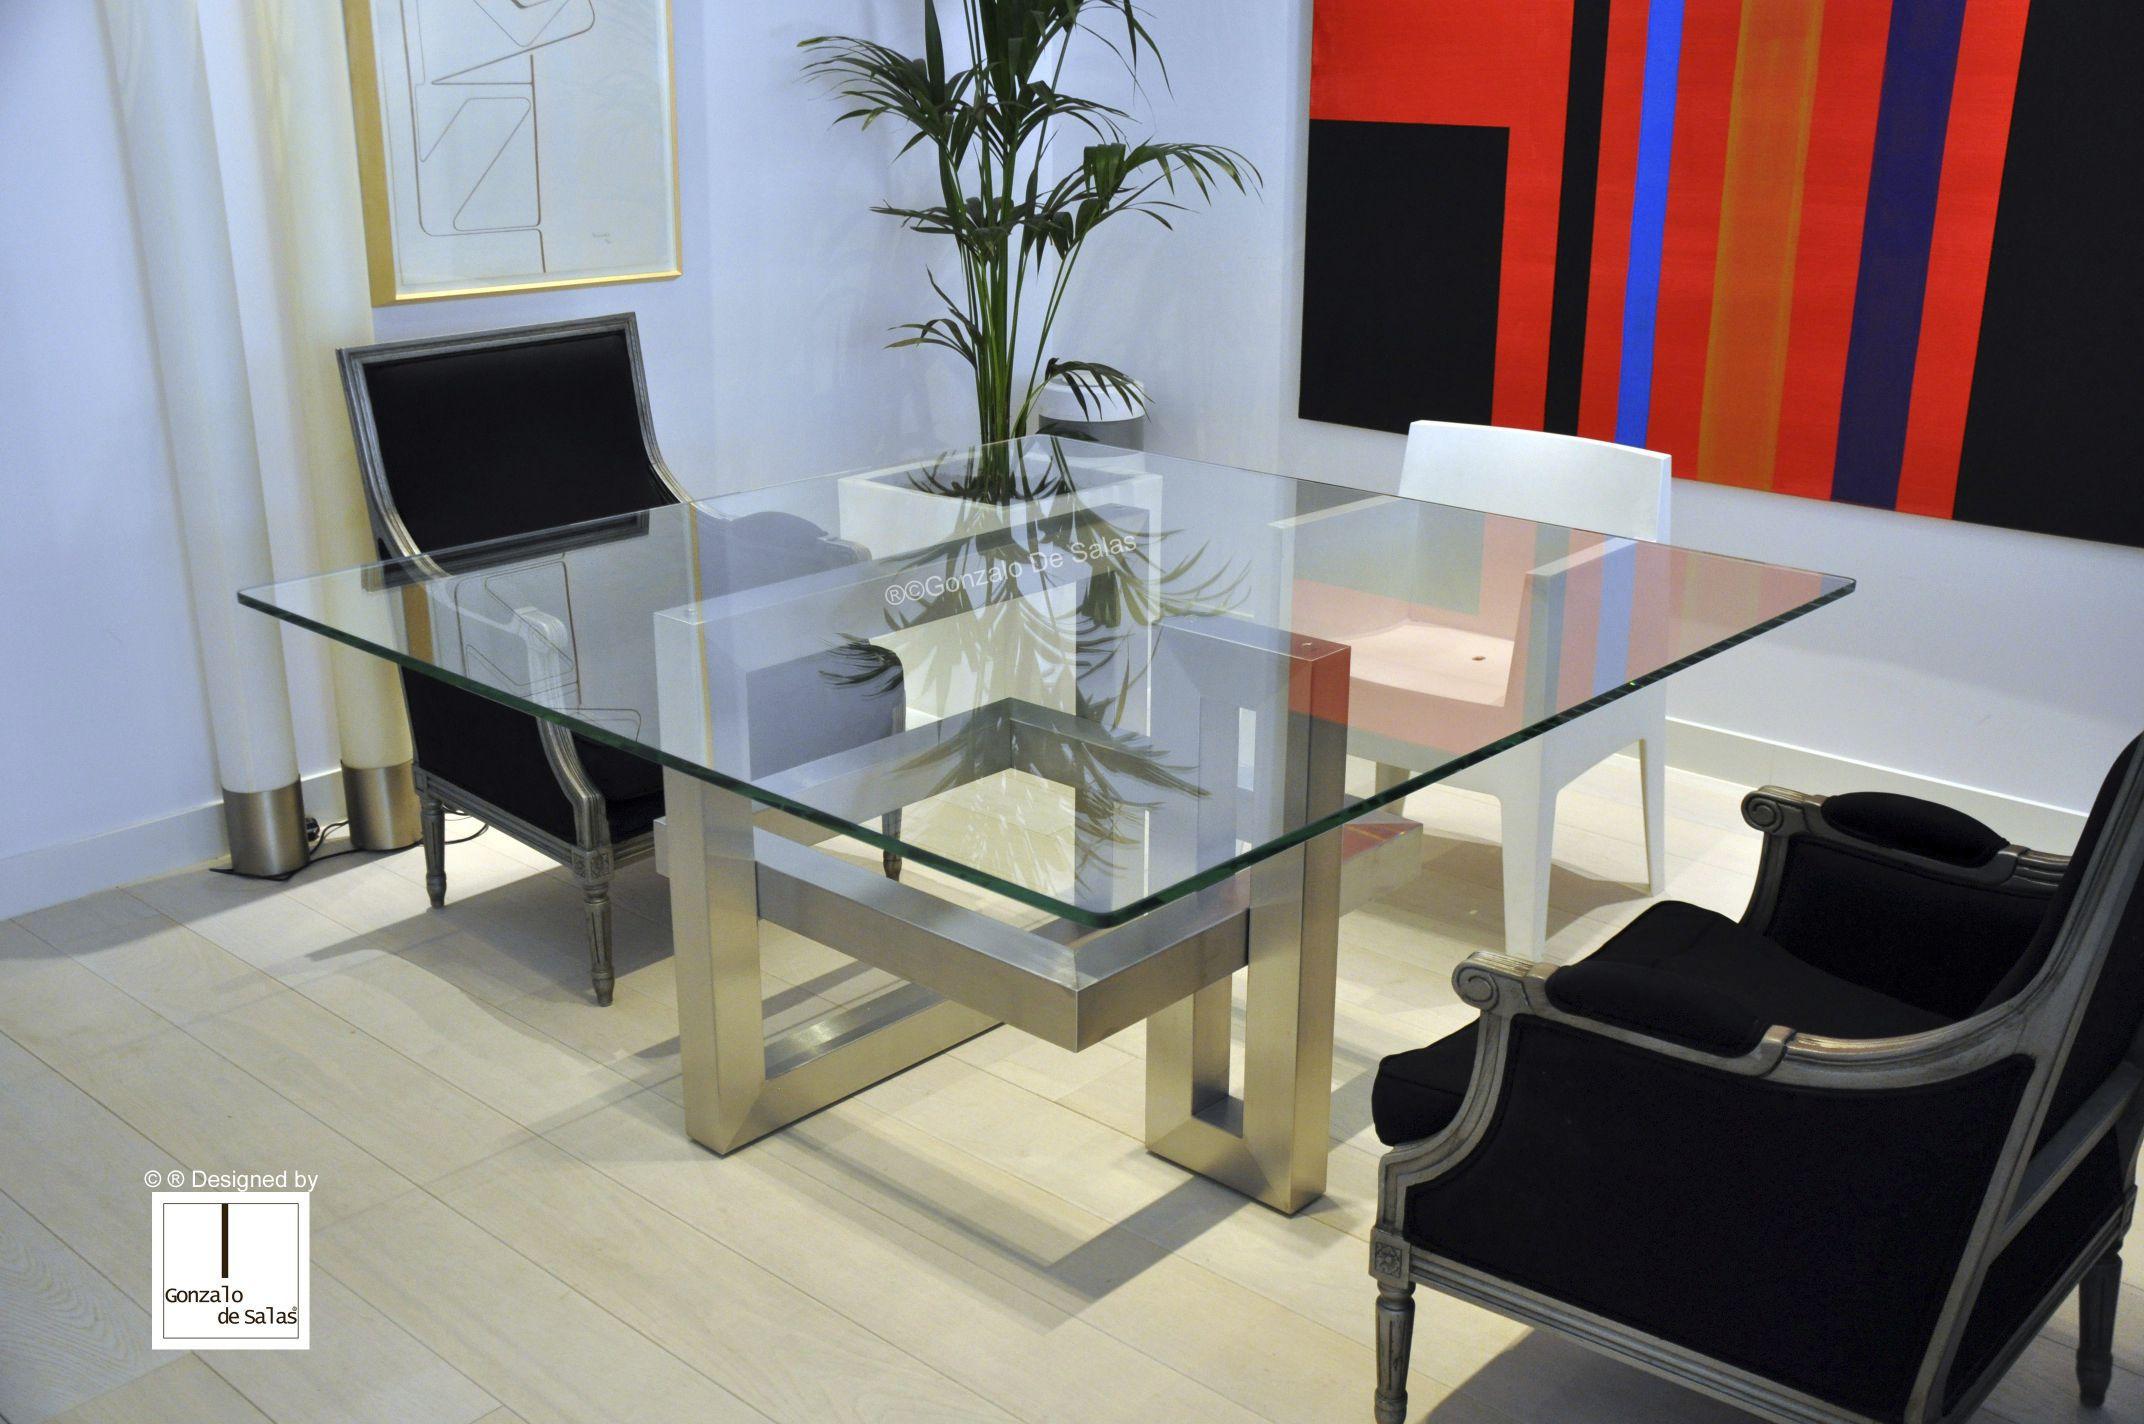 Mesa de edor moderna de vidrio de metal pintado de hierro